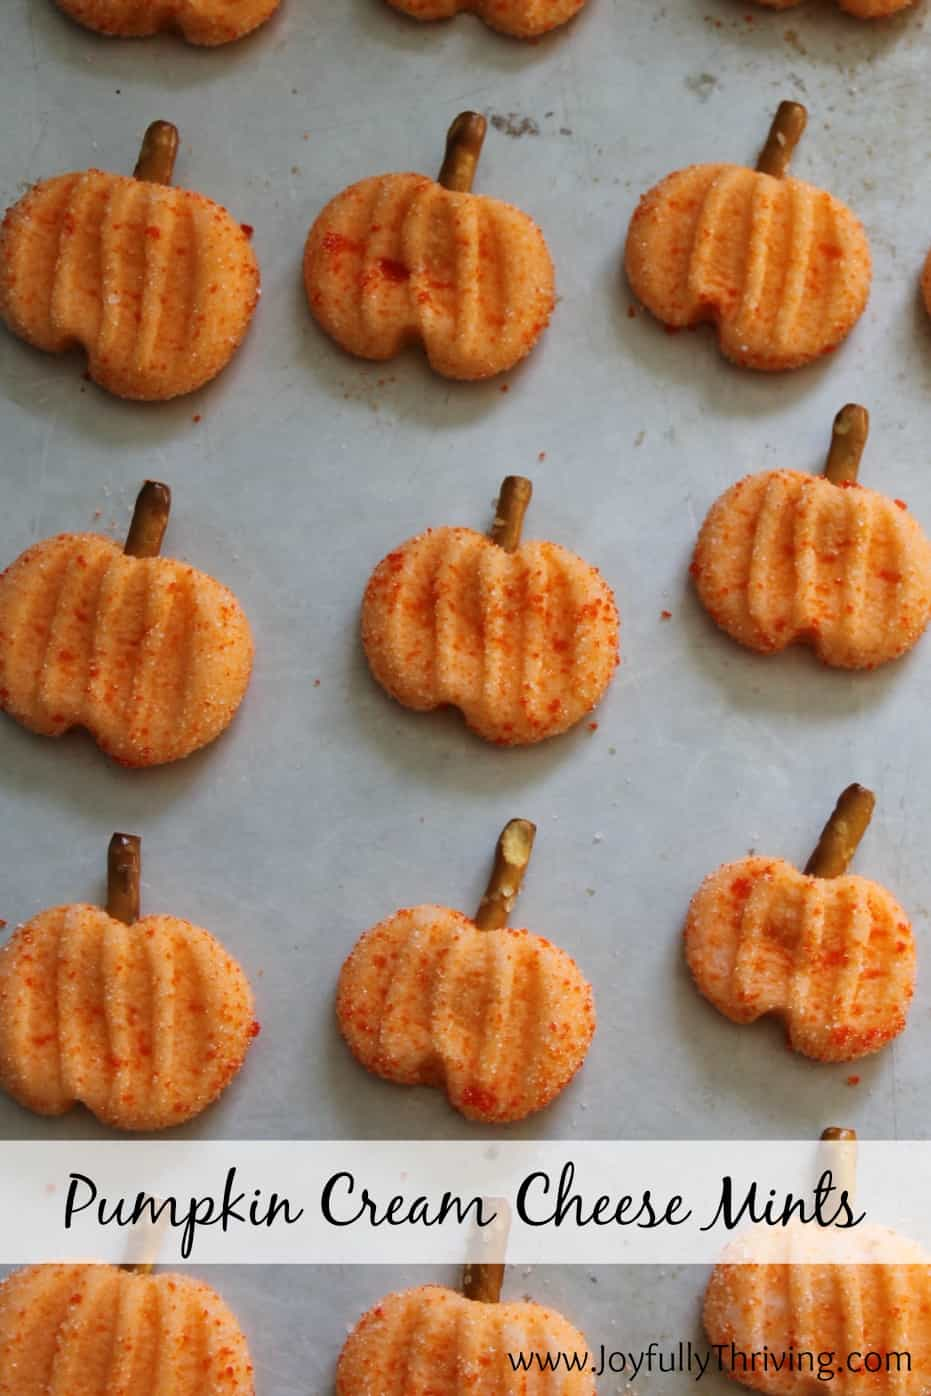 Pumpkin Cream Cheese Mints